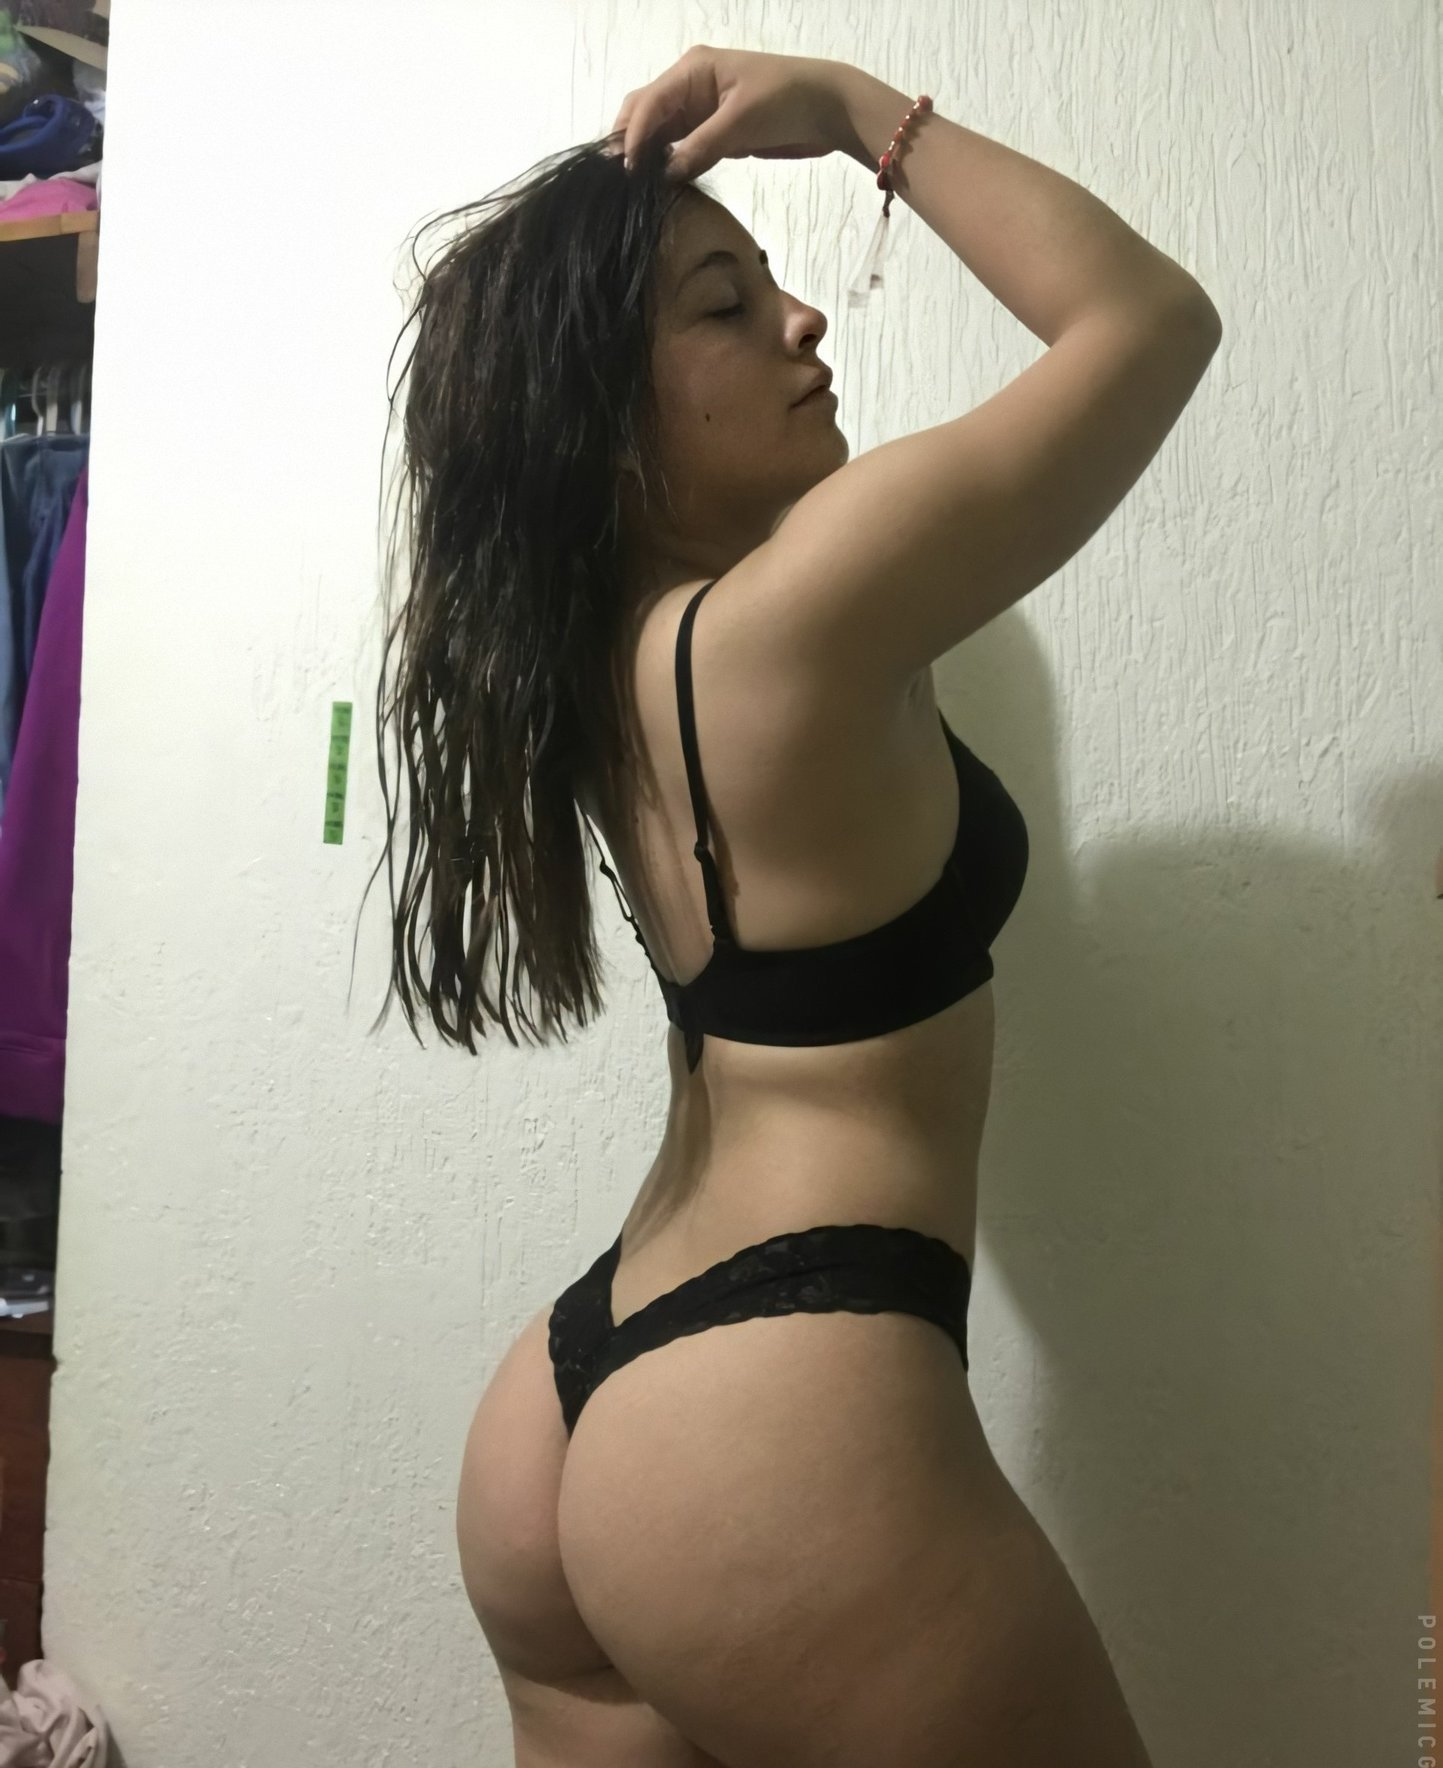 Itzel Yer, itzel.yer, Instagram Nude Leaks